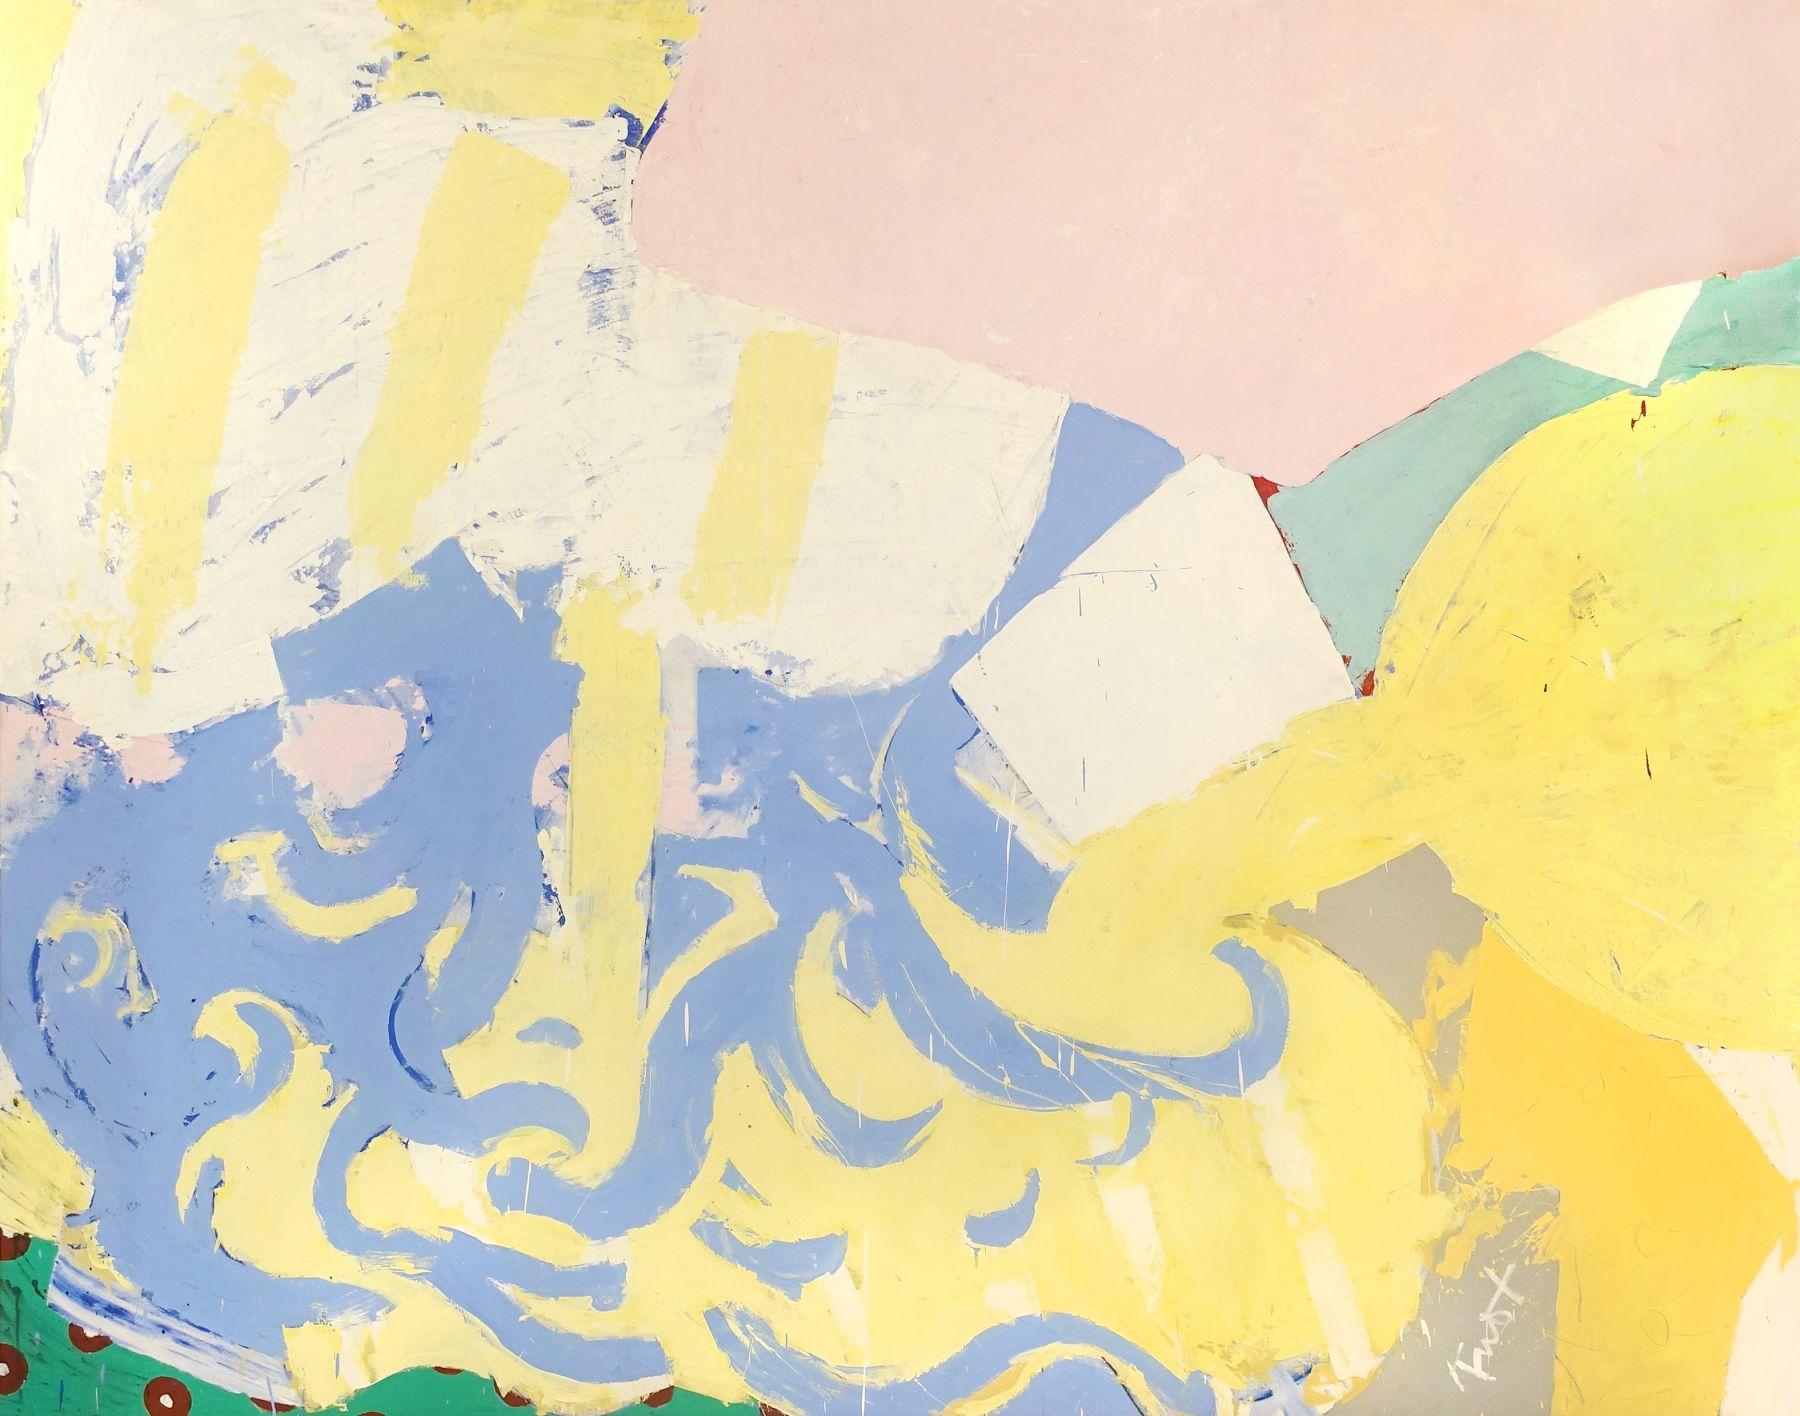 Knox Martin (b. 1923) Garden of Time, 1976